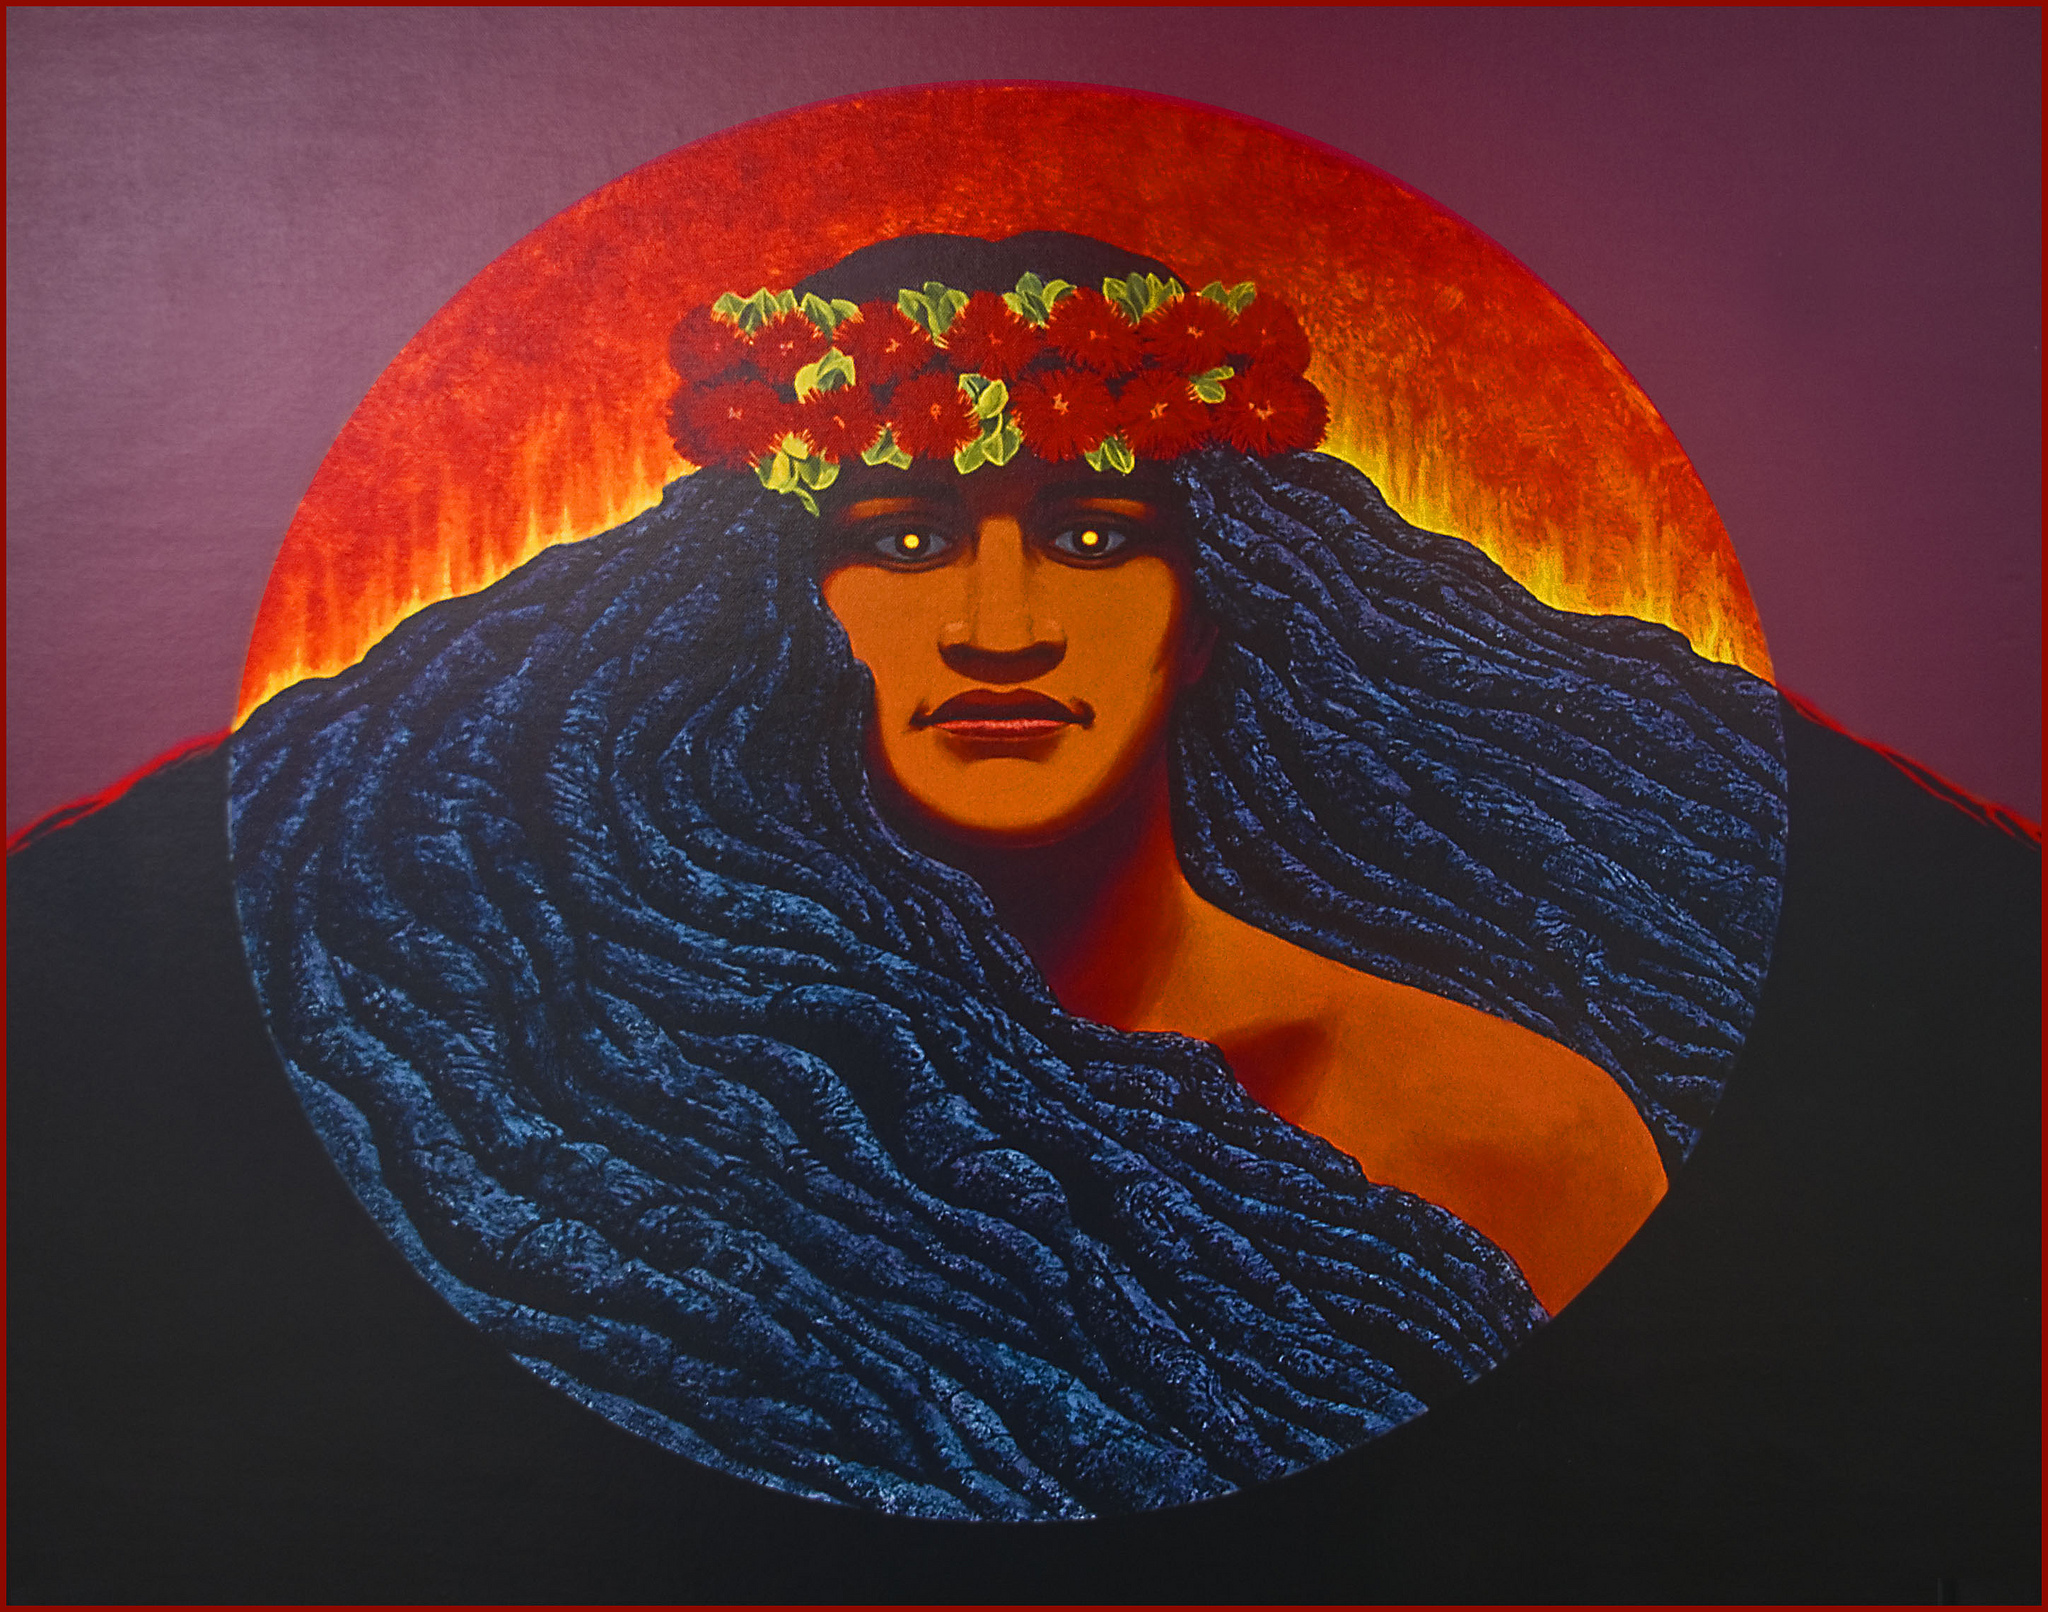 Māui (Māori mythology)